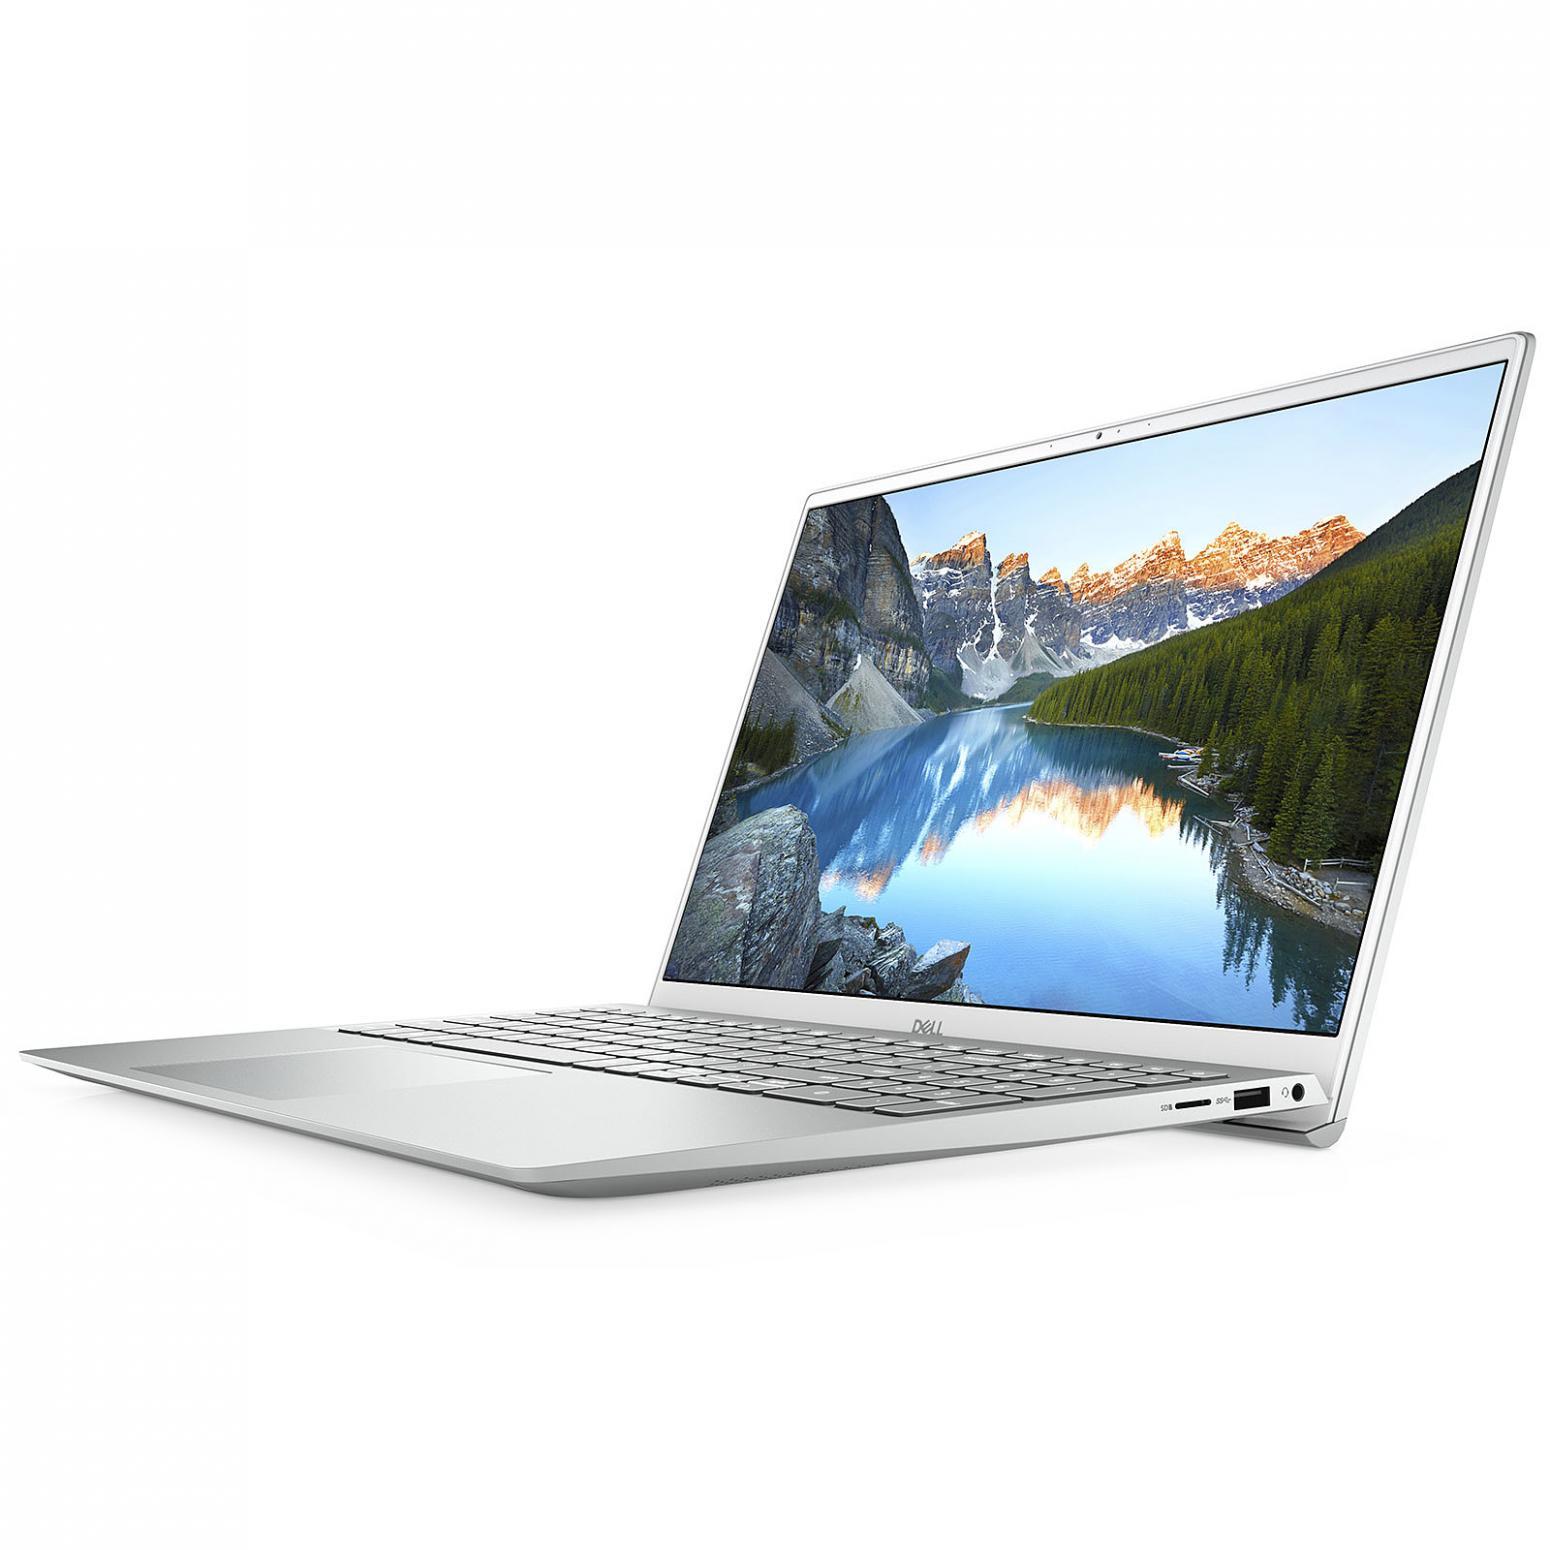 Ordinateur portable Dell Inspiron 15 5502 Argent - Core i5, SSD 256 Go - photo 5